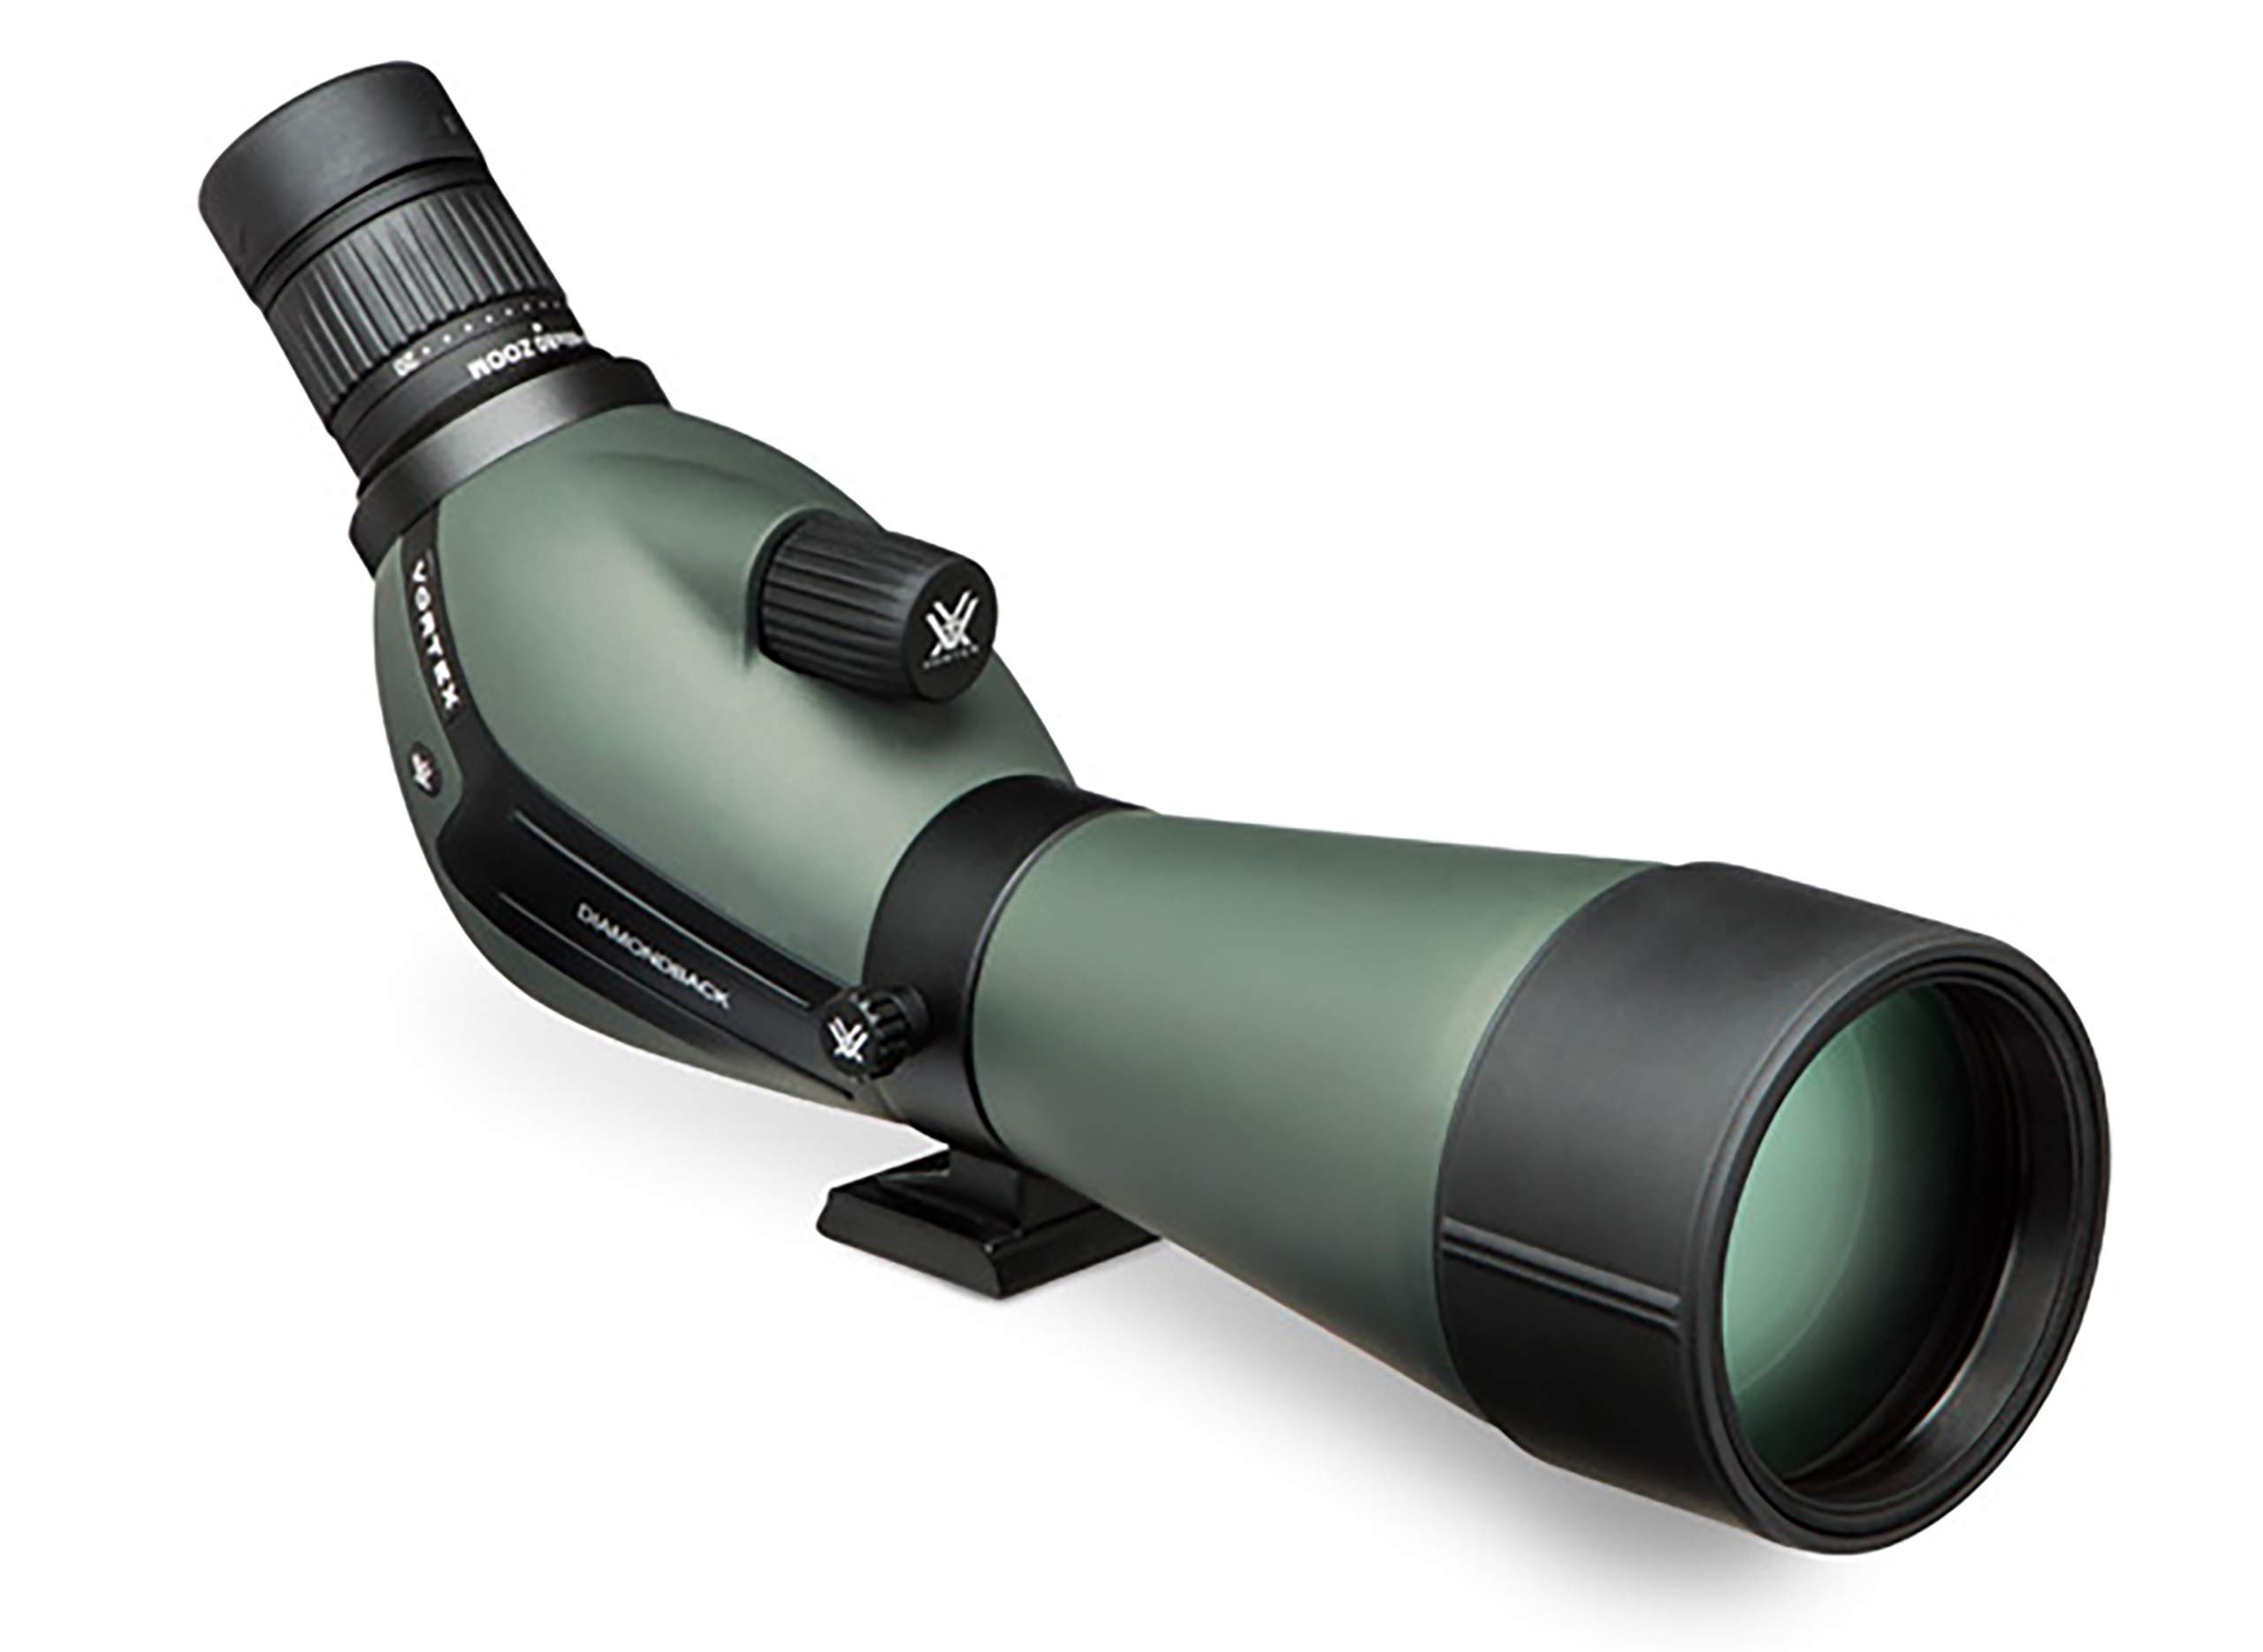 Vortex Optics Diamondback Spotting Scope 20-60x80 Angled by Vortex Optics